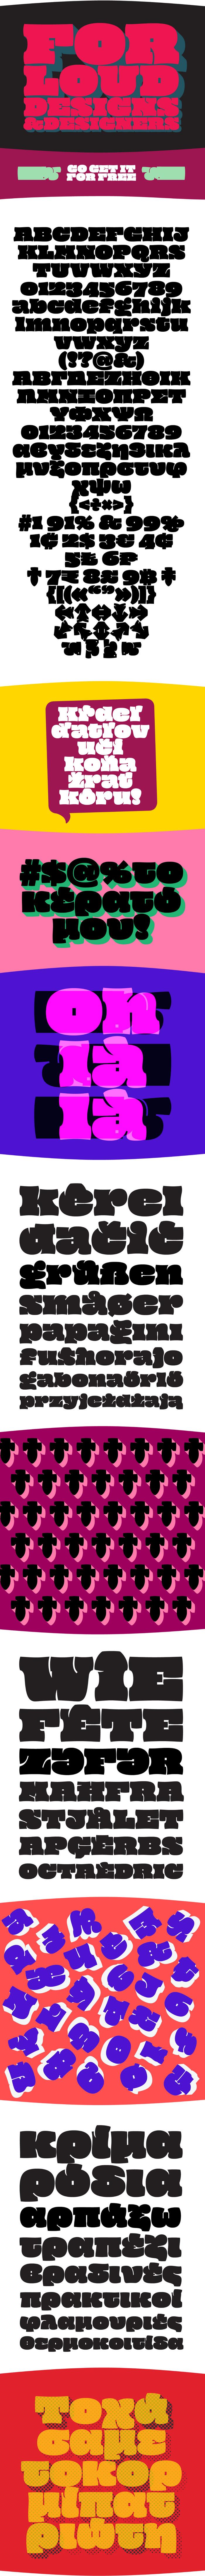 oi-typeface-1